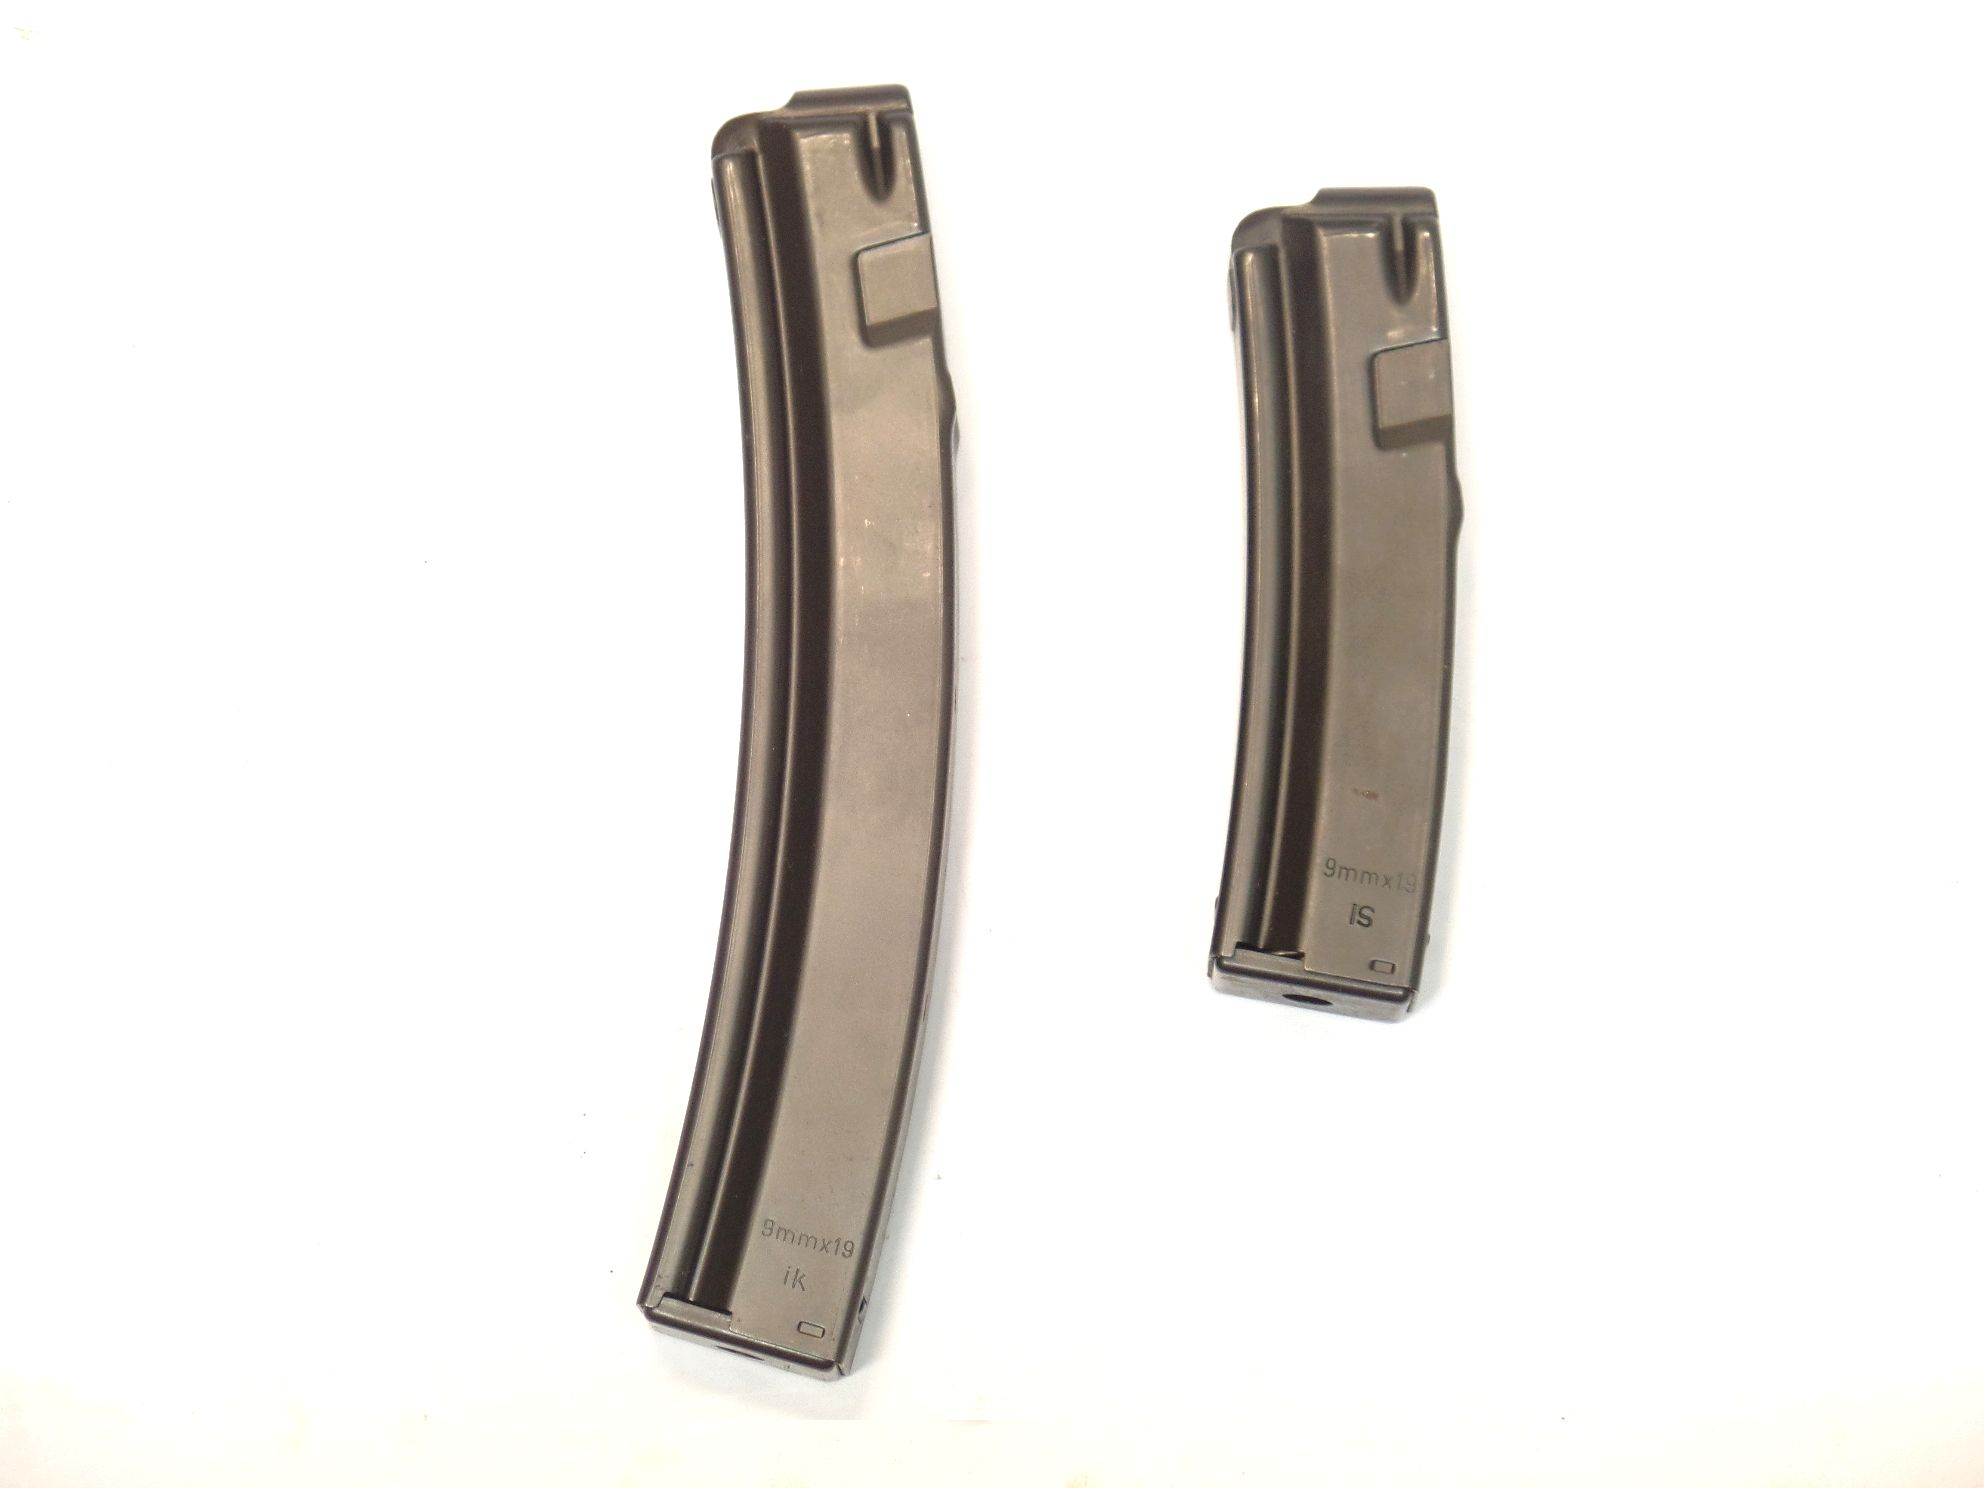 Chargeur HK MP5 calibre 9Para